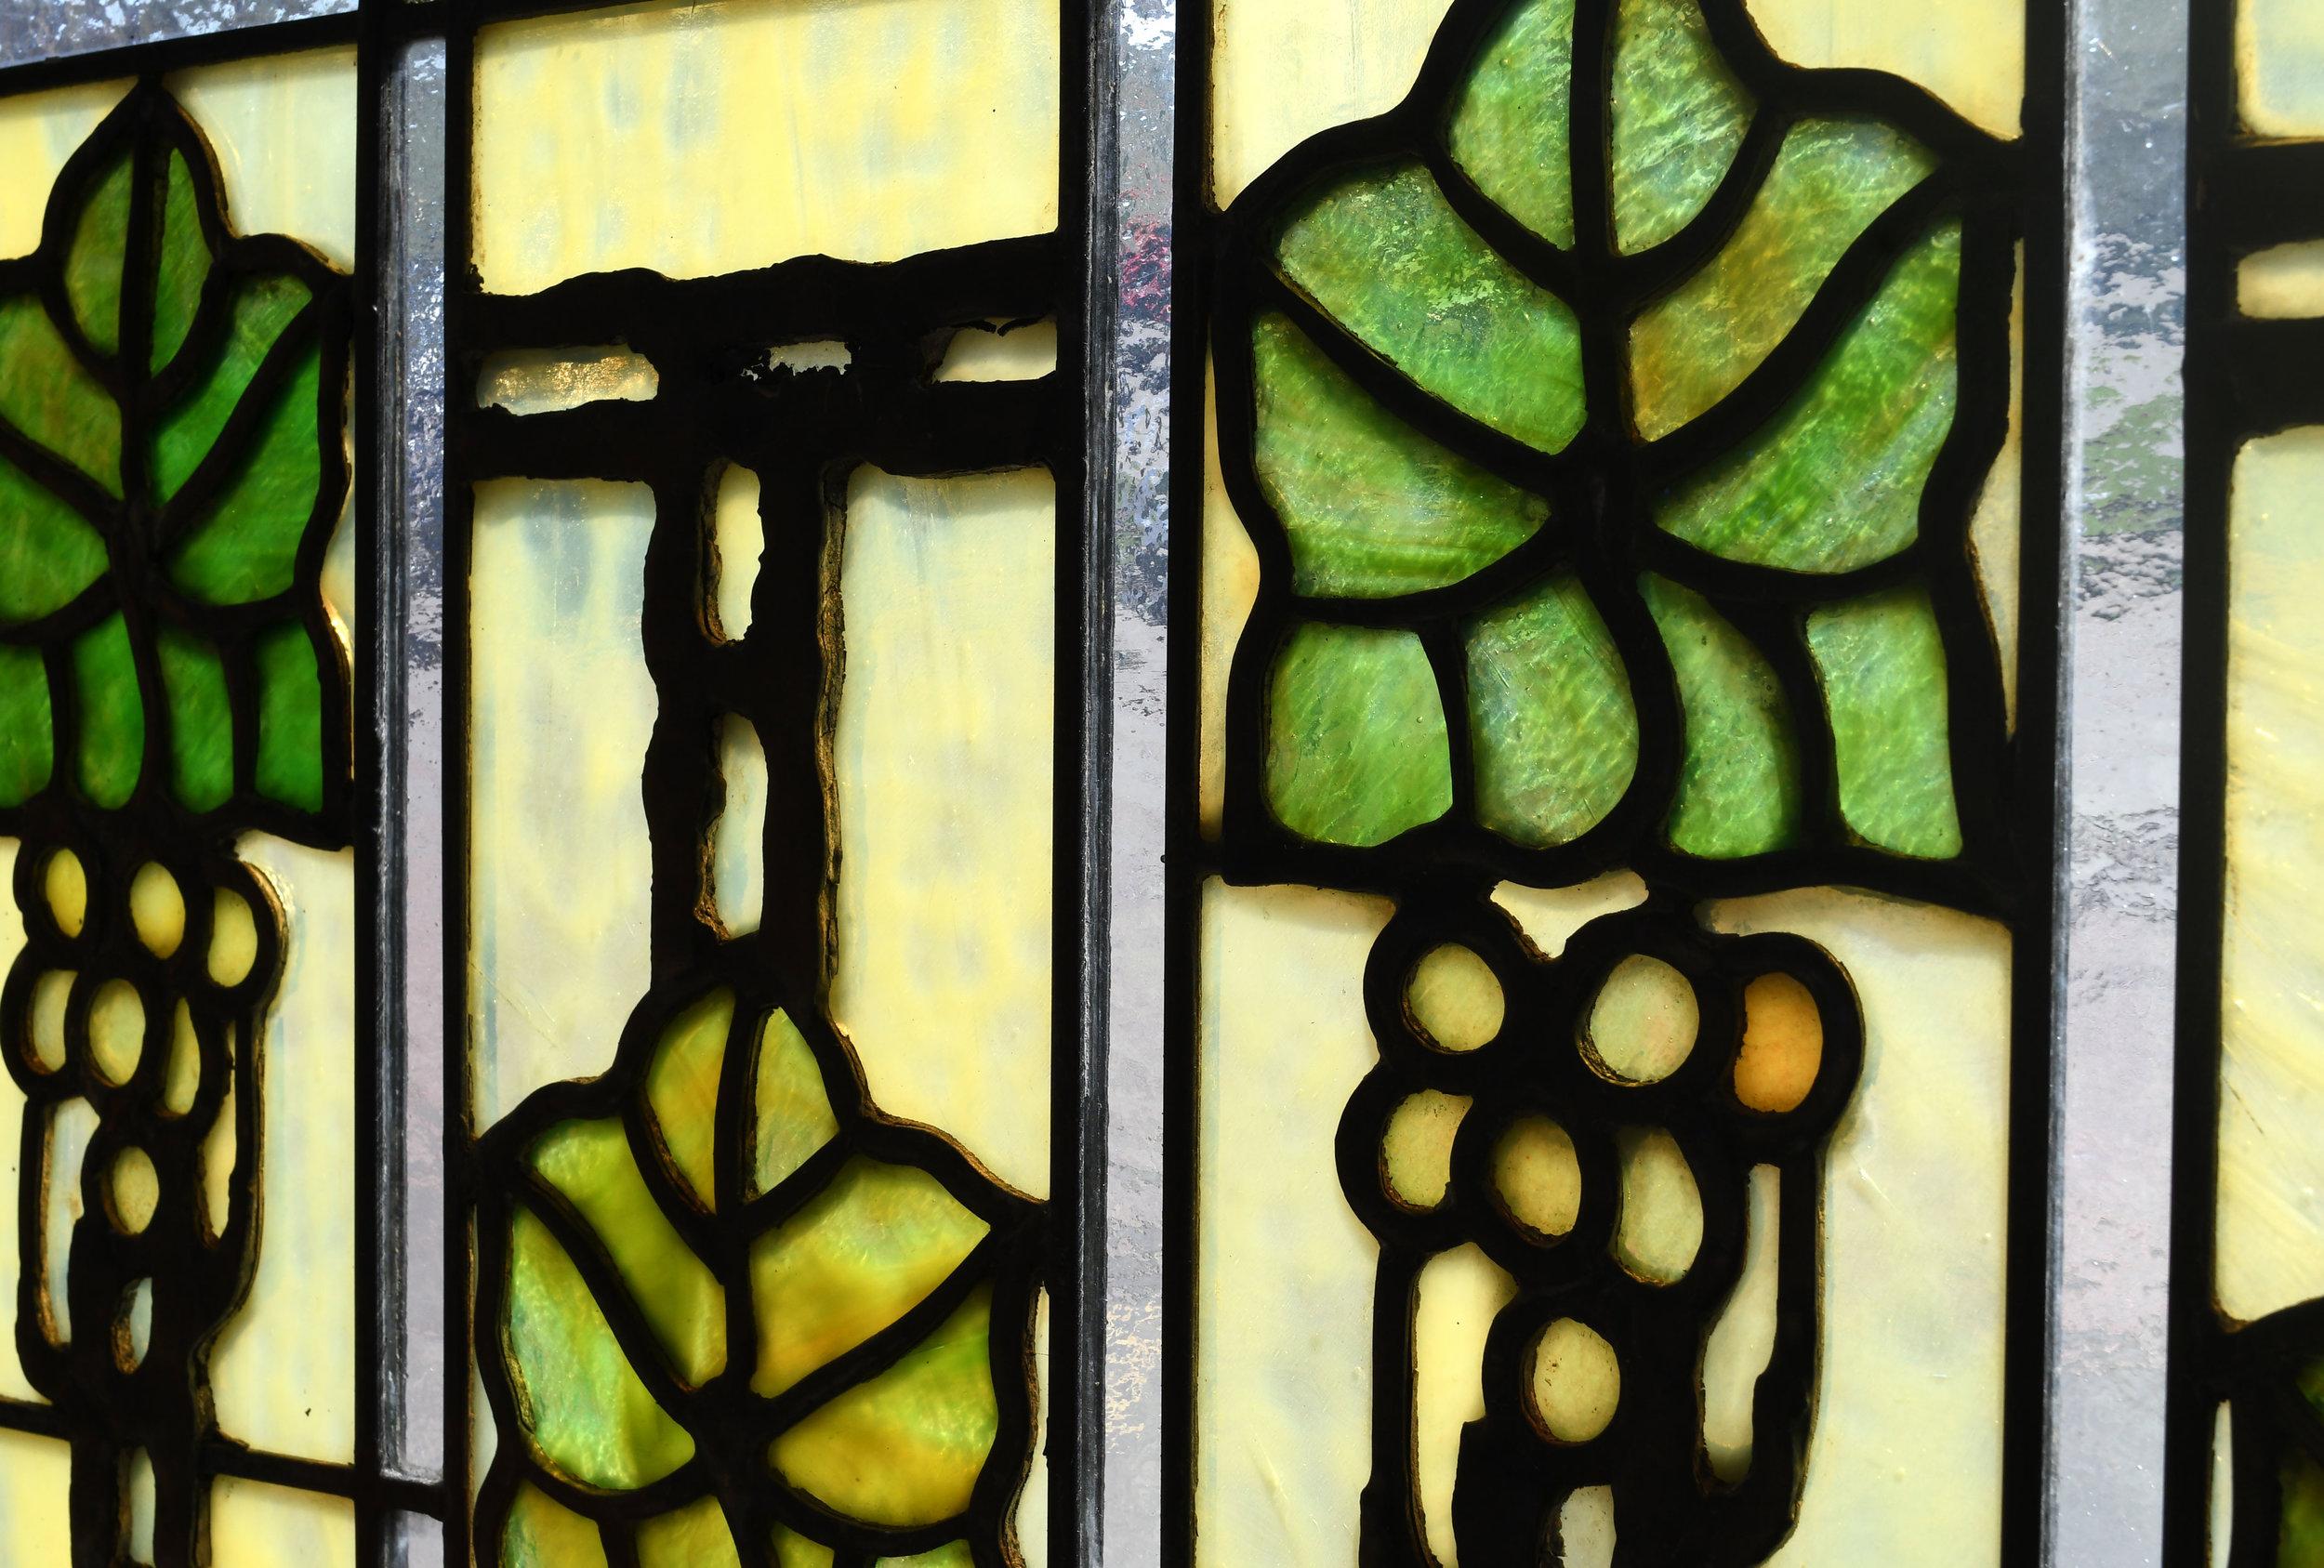 47809-bradstreet-grape-leaves-window-backlit-detail.jpg